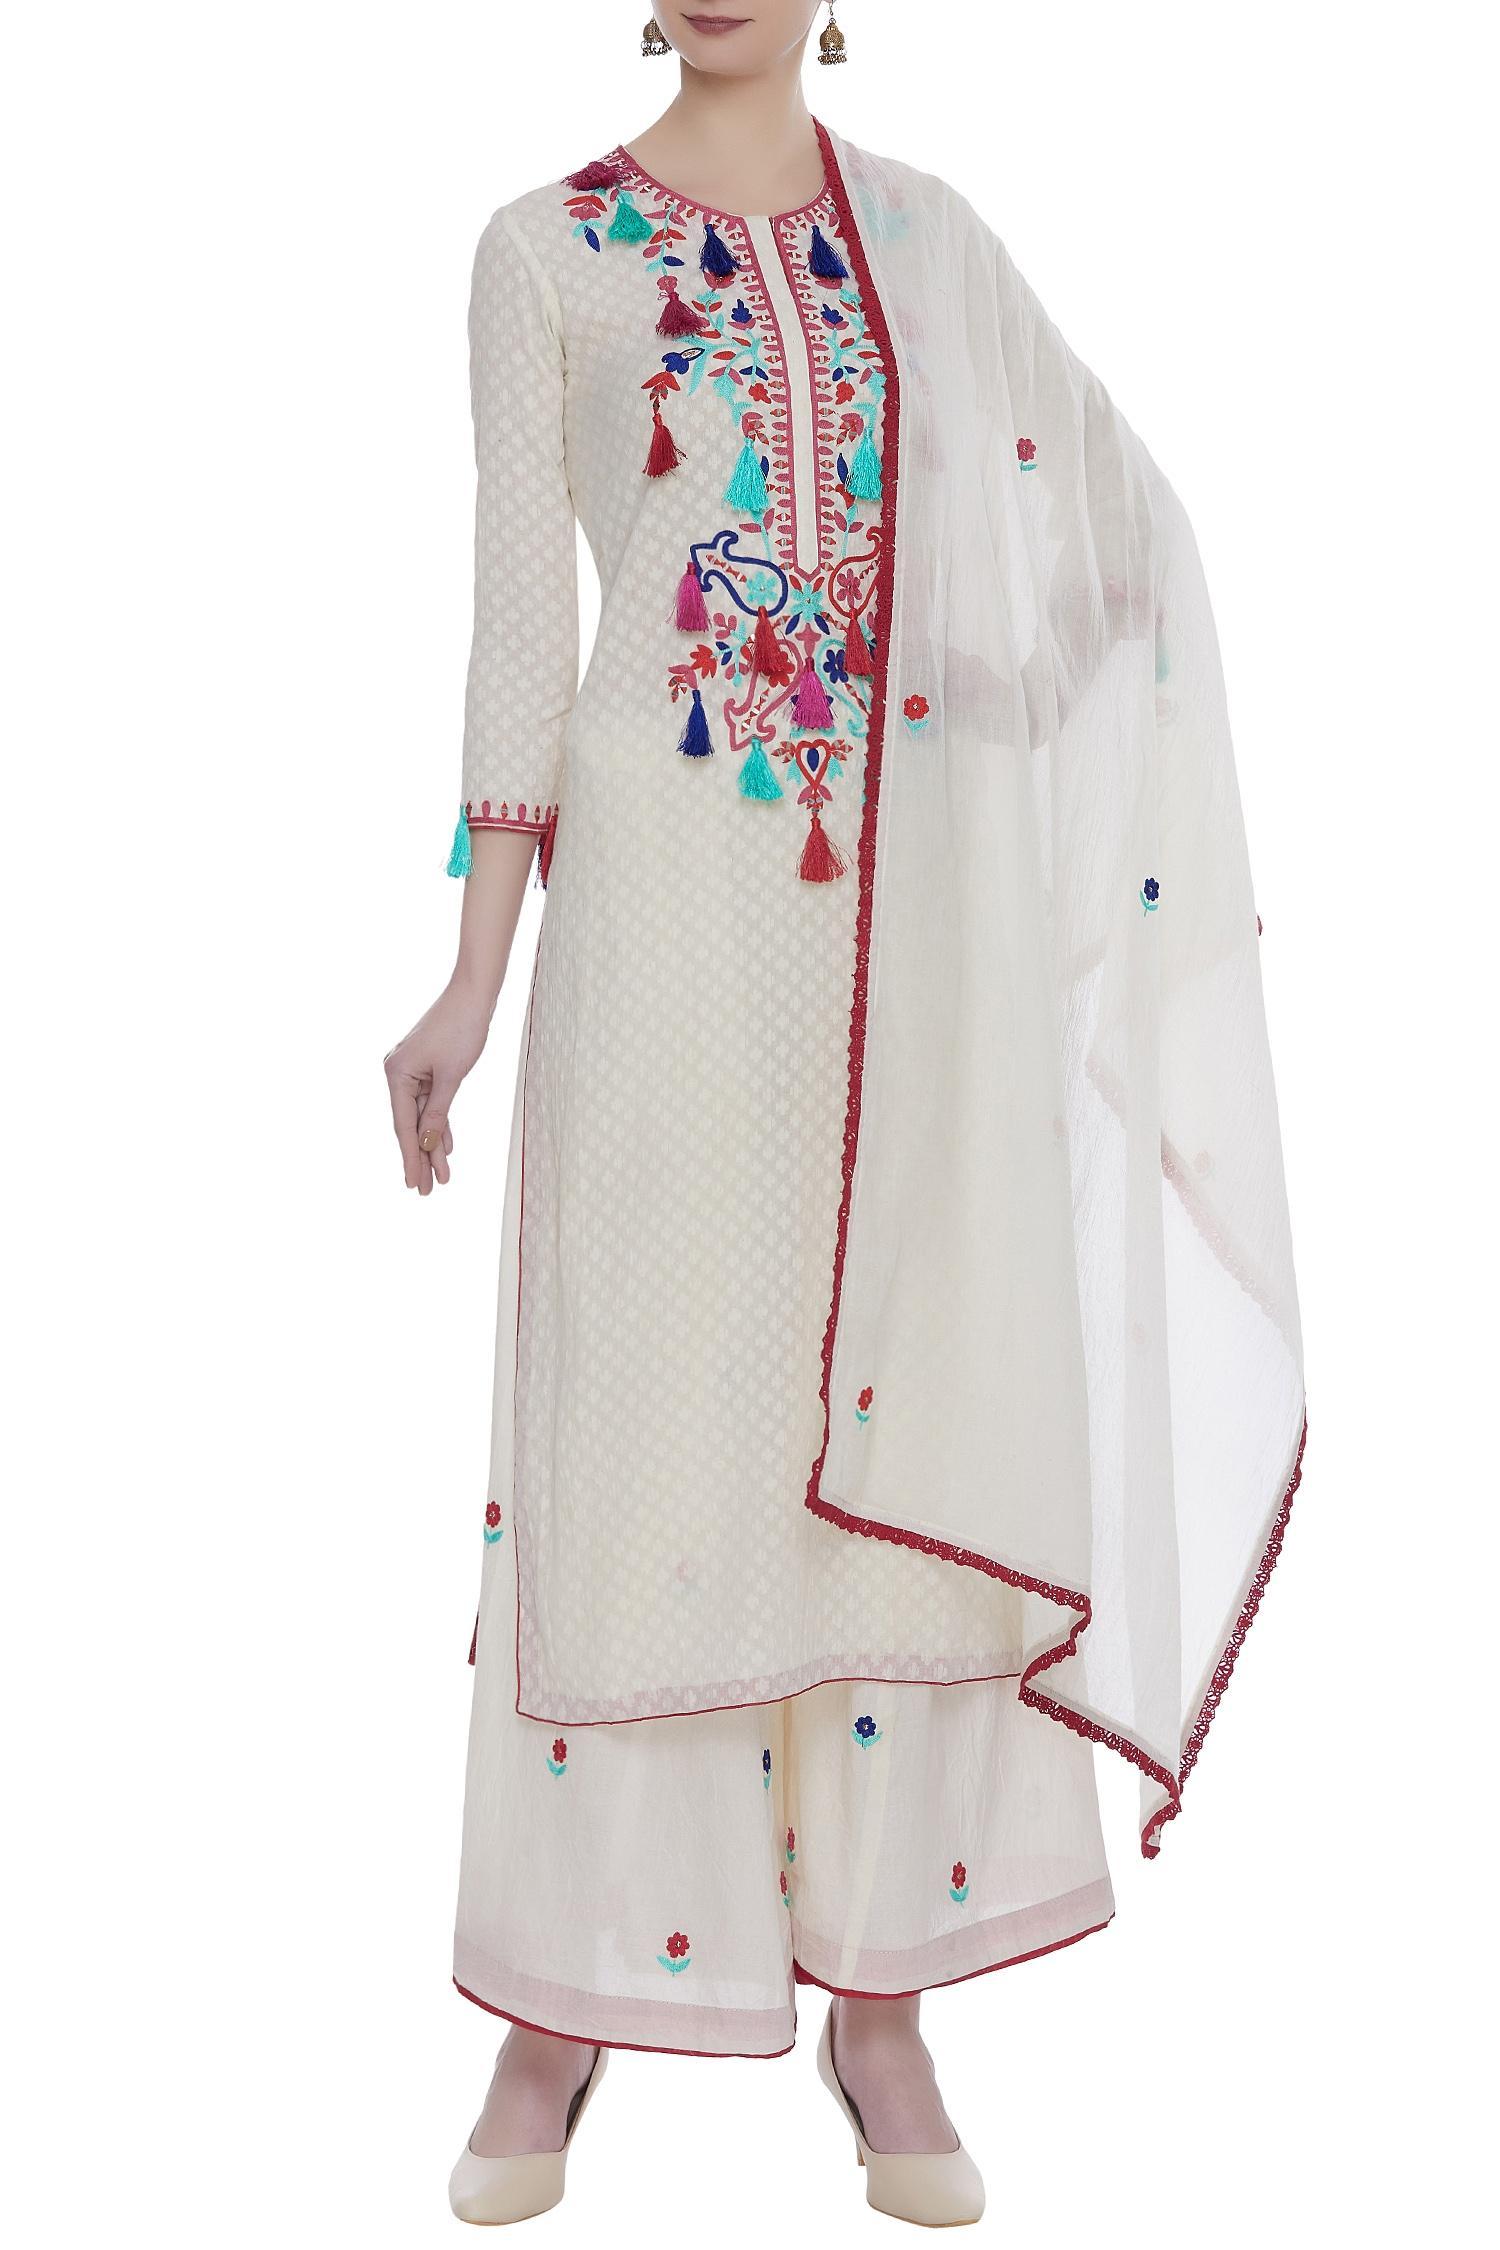 Aza fashions pvt ltd 24